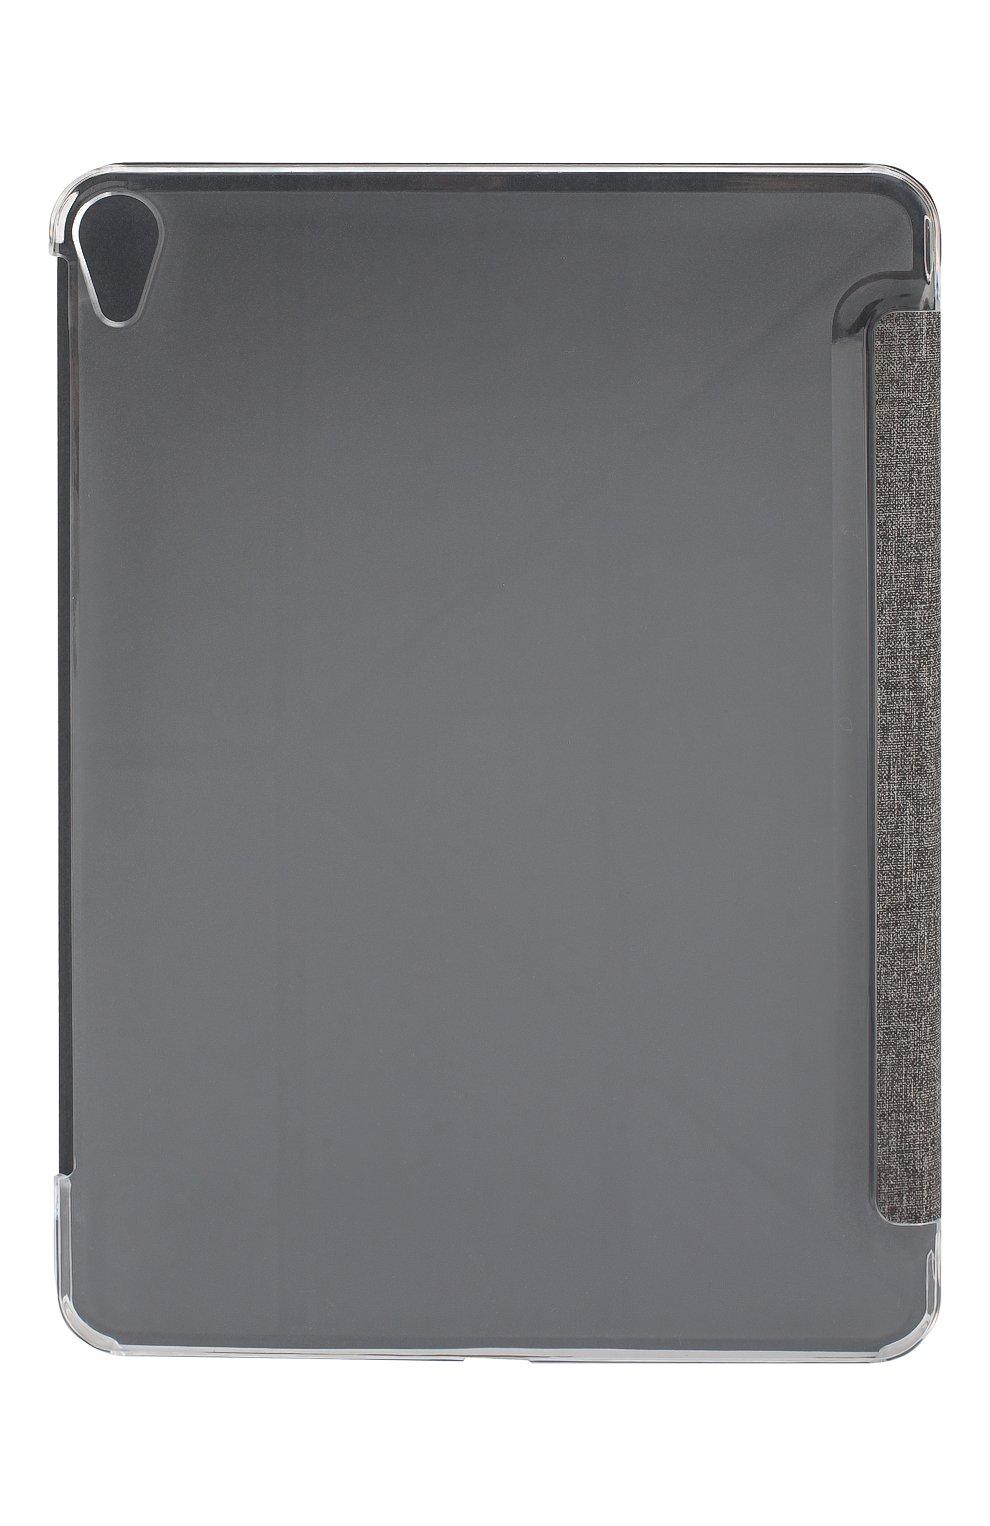 "Мужской чехол для ipad pro 11"" UNIQ серого цвета, арт. NPDP11YKR(2018)-KNVPGRY   Фото 2"